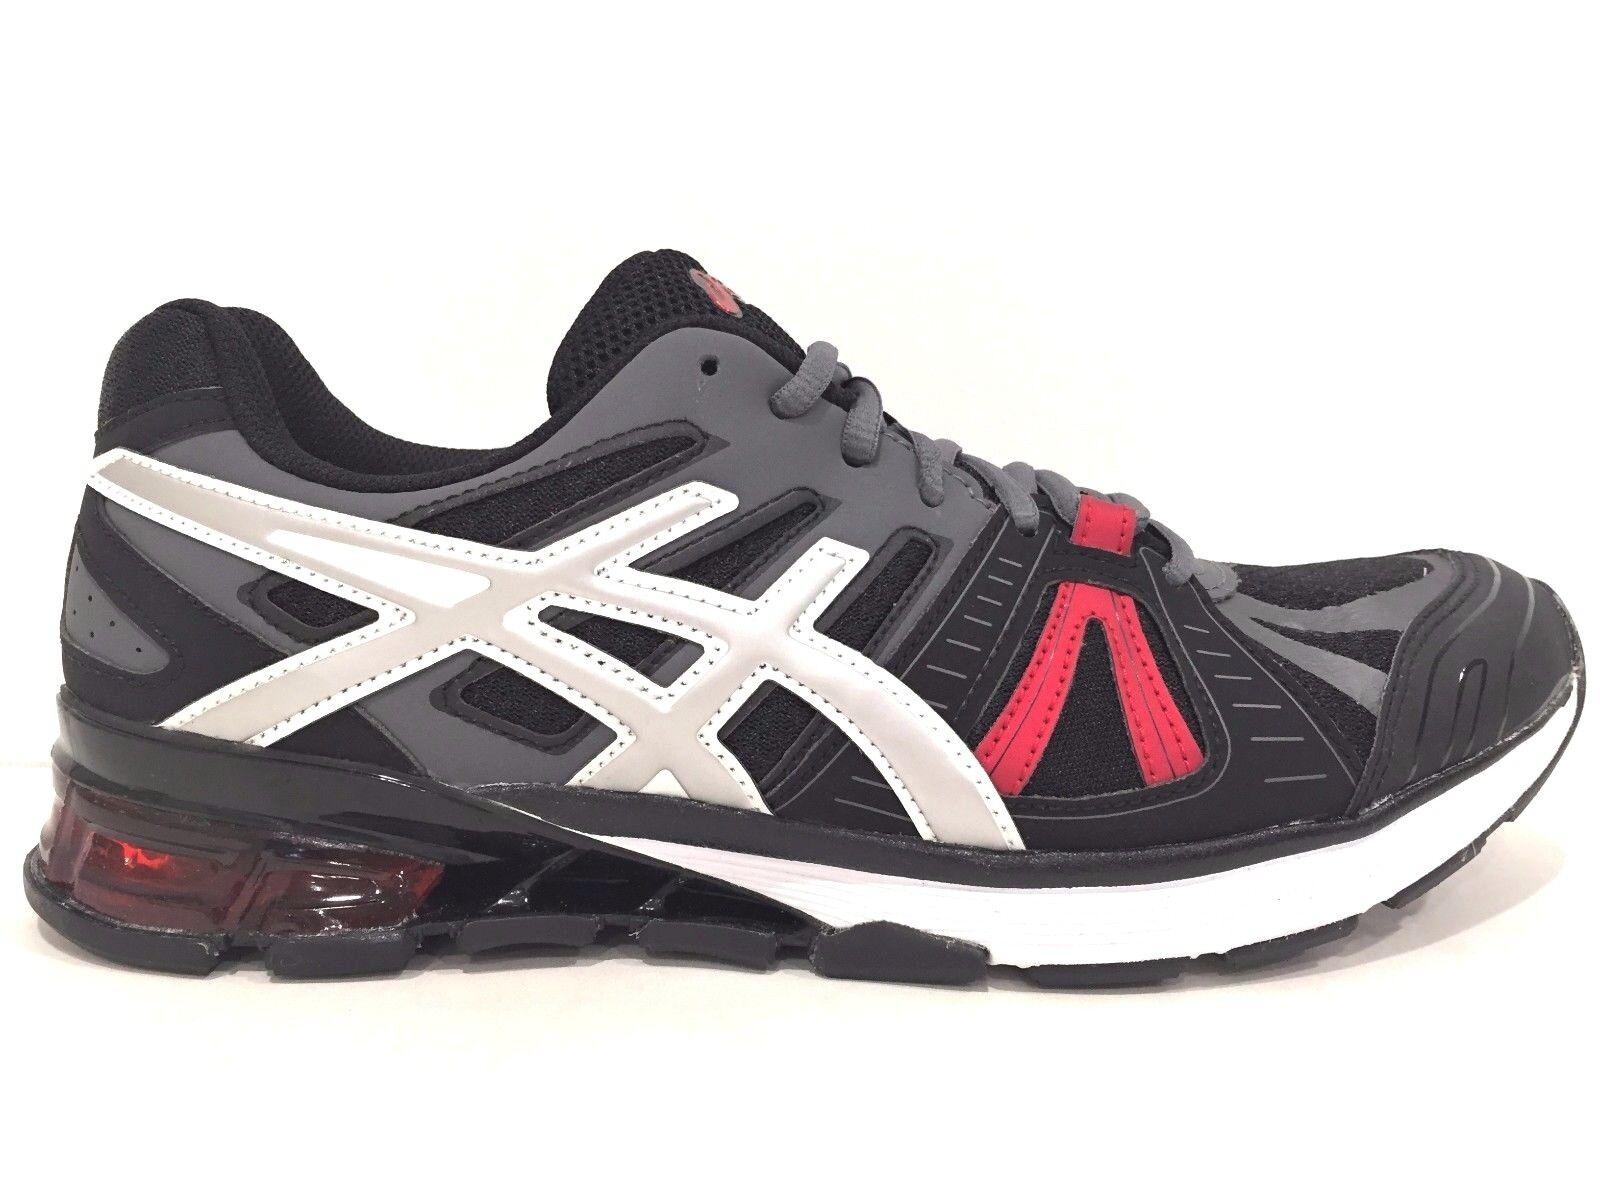 ASICS Men's Gel-Defiant 2 Training shoes, Onyx Silver Red 11.5 M US